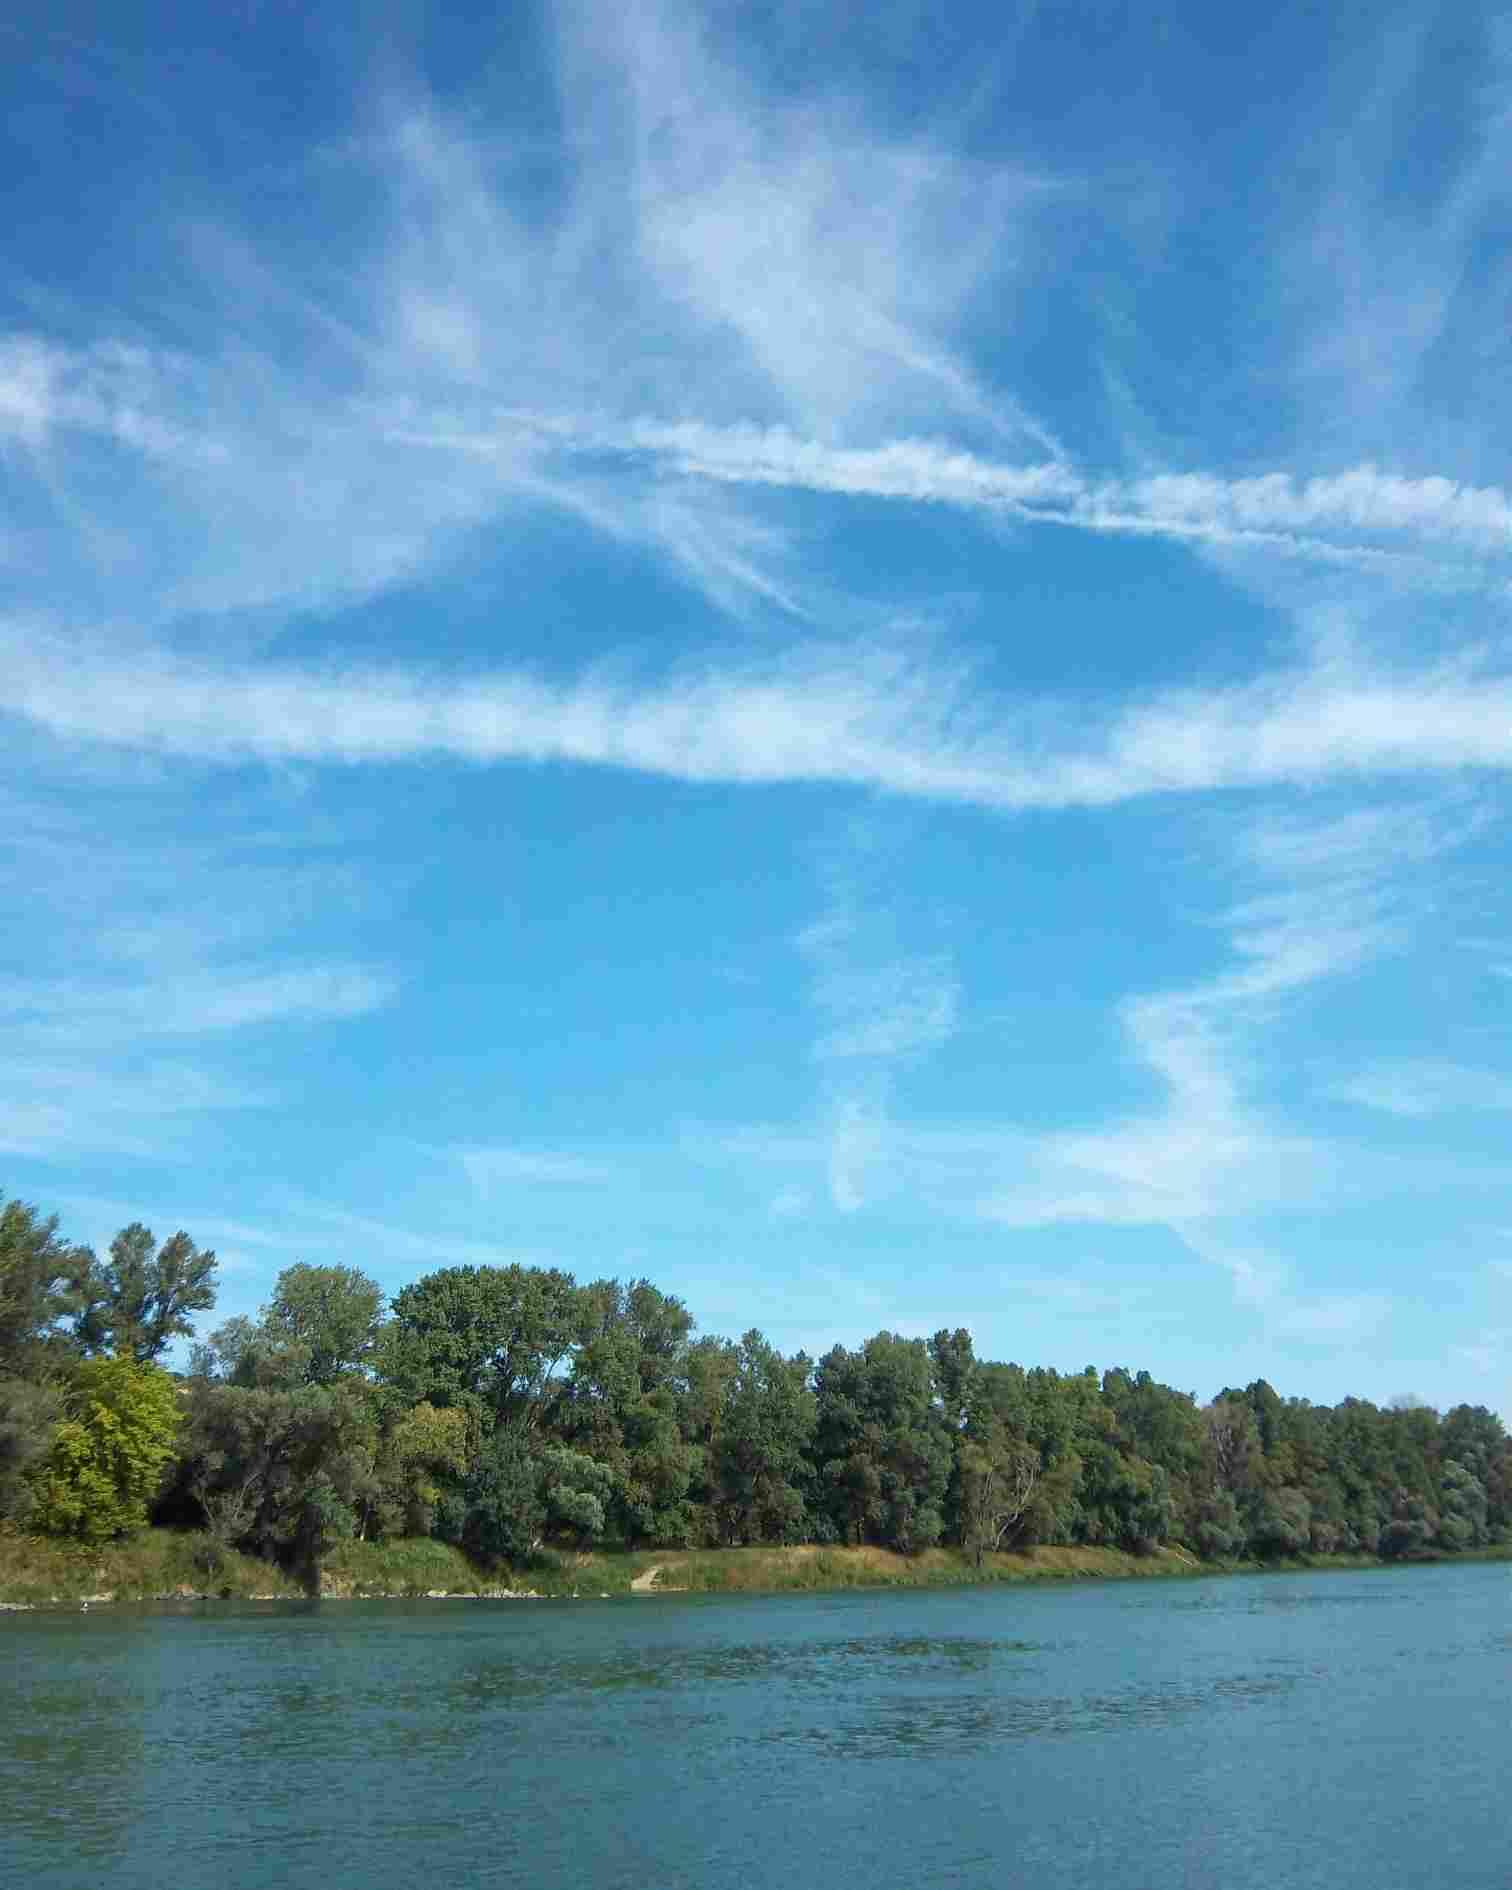 Le Rhône à Feyzin - Photo de Patrick Huet